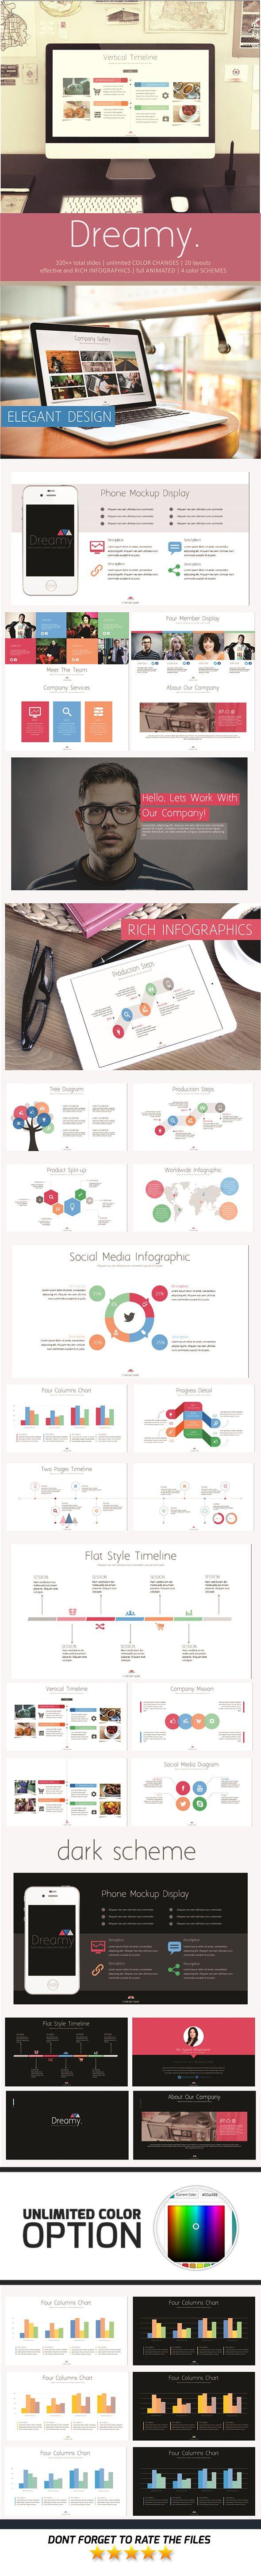 Dreamy PowerPoint Template #slides #design Download: http://graphicriver.net/item/dreamy-powerpoint-template/11948165?ref=ksioks